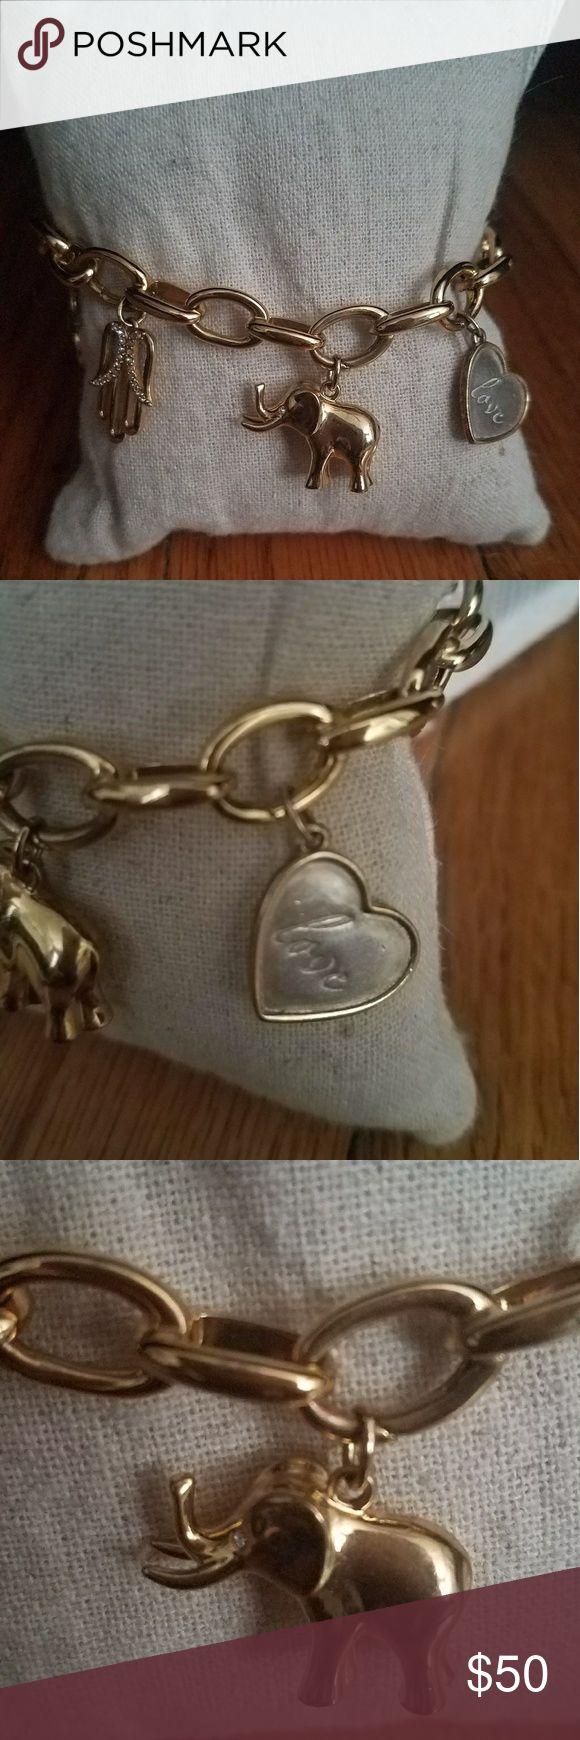 Stella and Dot Charm Chain Bracelet Signature Link Charm Bracelet from Stella and Dot. Includes 5 charms (Wishbone, Heart Love, Elephant, Hamsa and Stella & Dot Charm) Stella & Dot Jewelry Bracelets